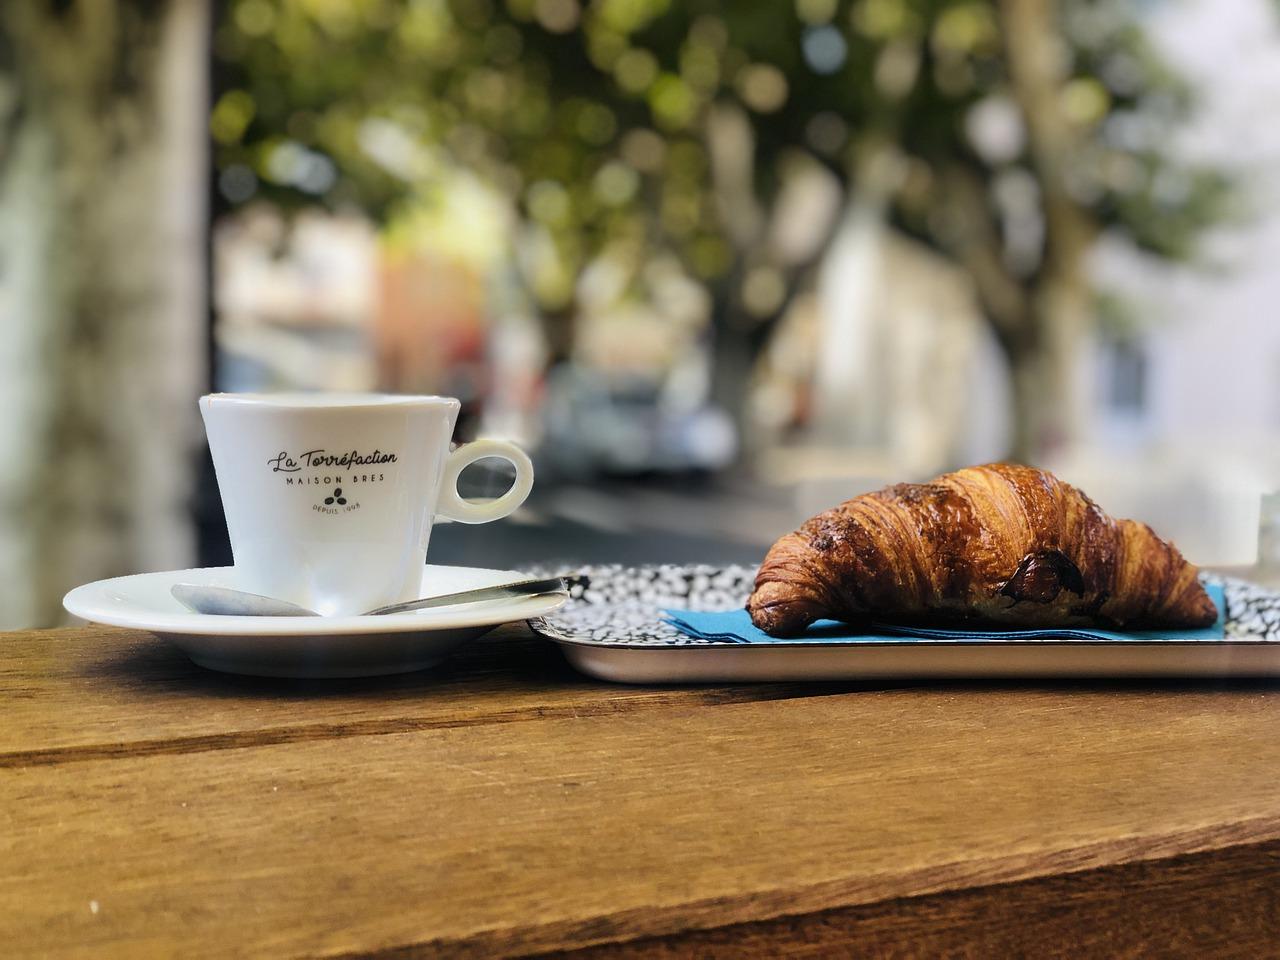 Croissant Breakfast Espresso France  - xat-ch / Pixabay